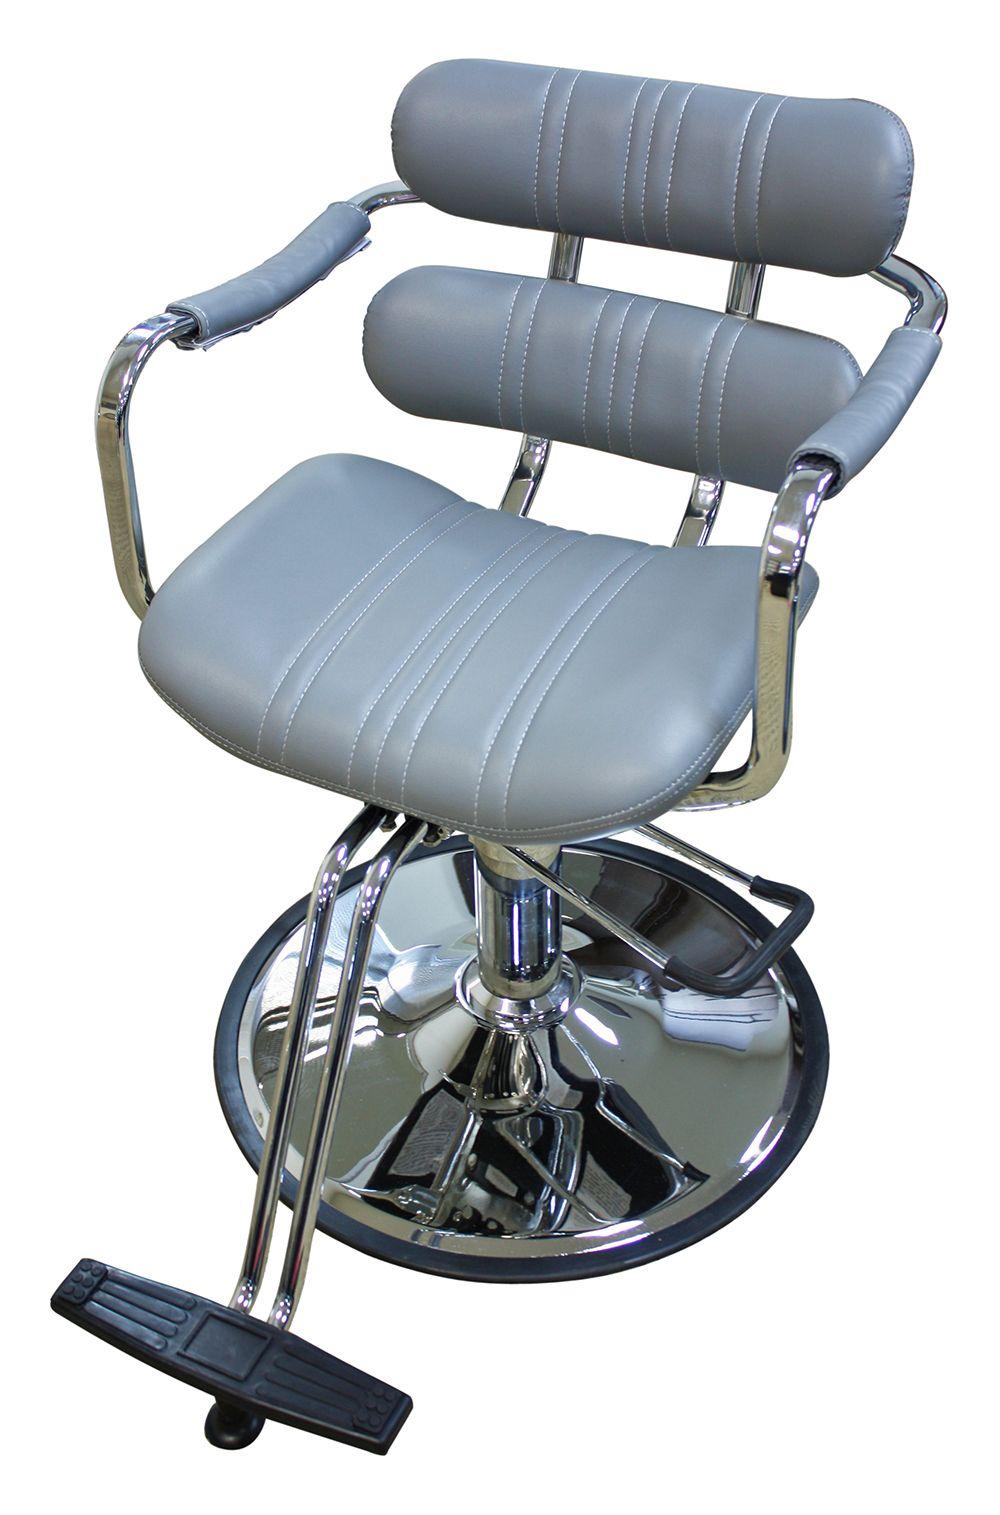 Astonishing Hair Salon Chairs Styling Chairs Salon Equipment And Bralicious Painted Fabric Chair Ideas Braliciousco